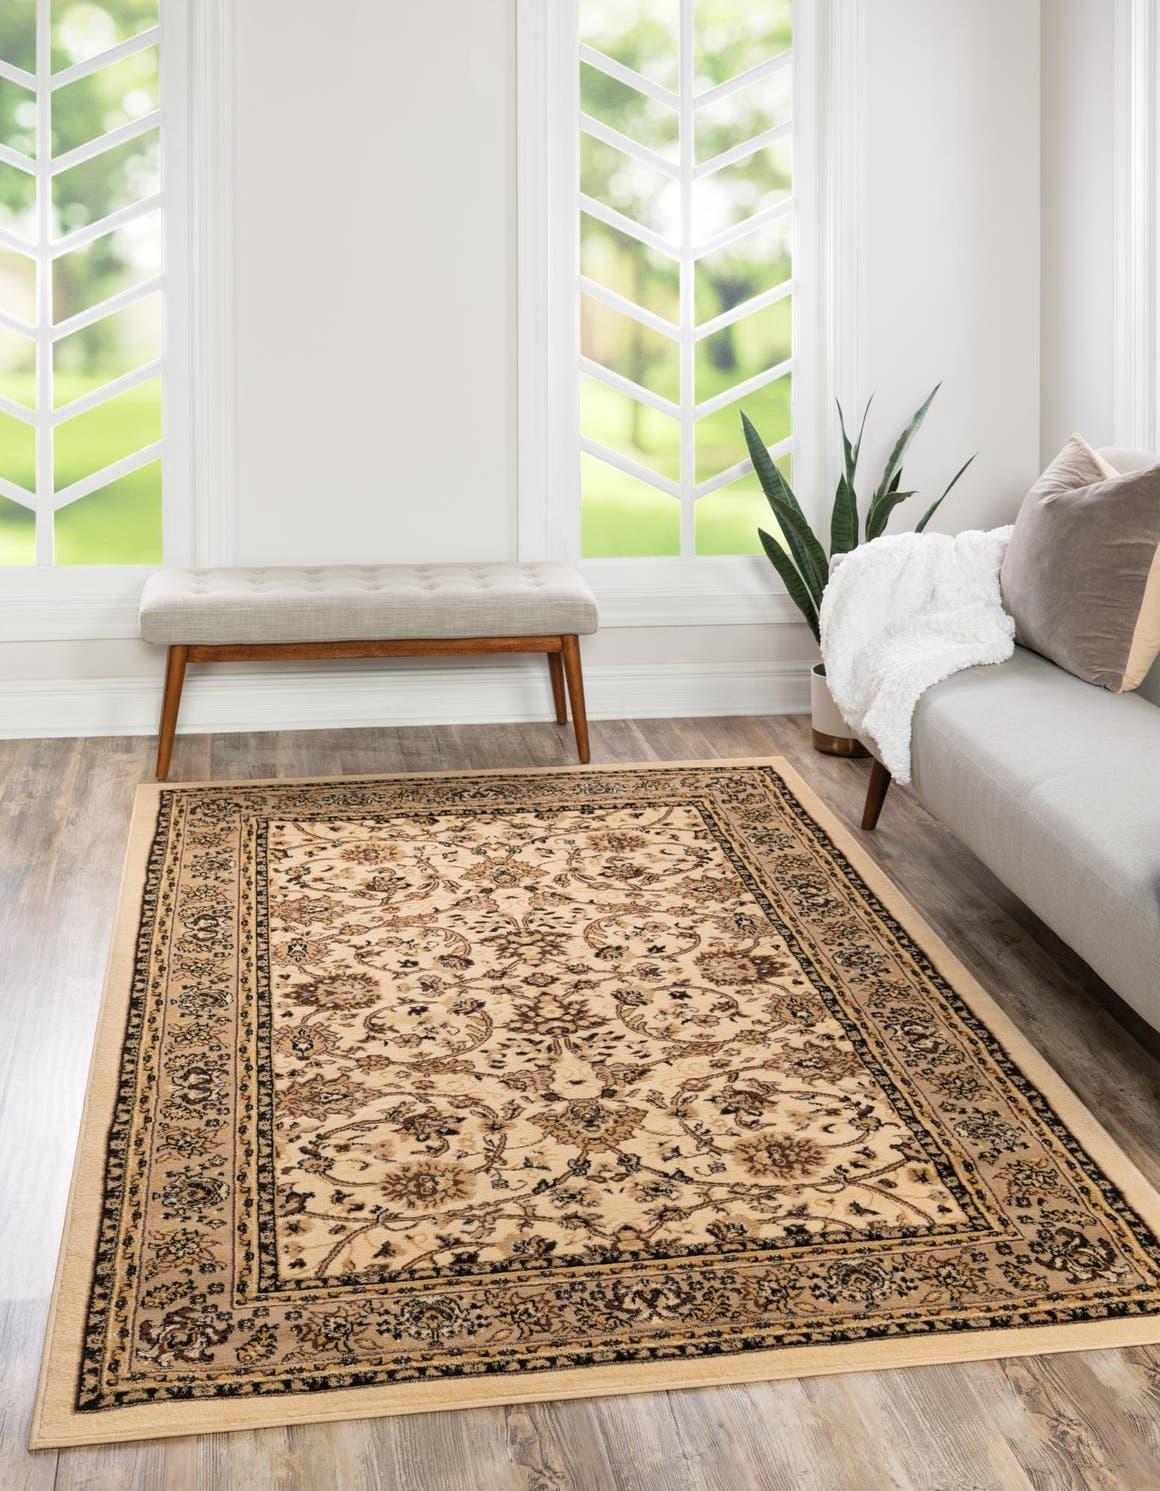 6' x 9' Kashan Design Rug main image